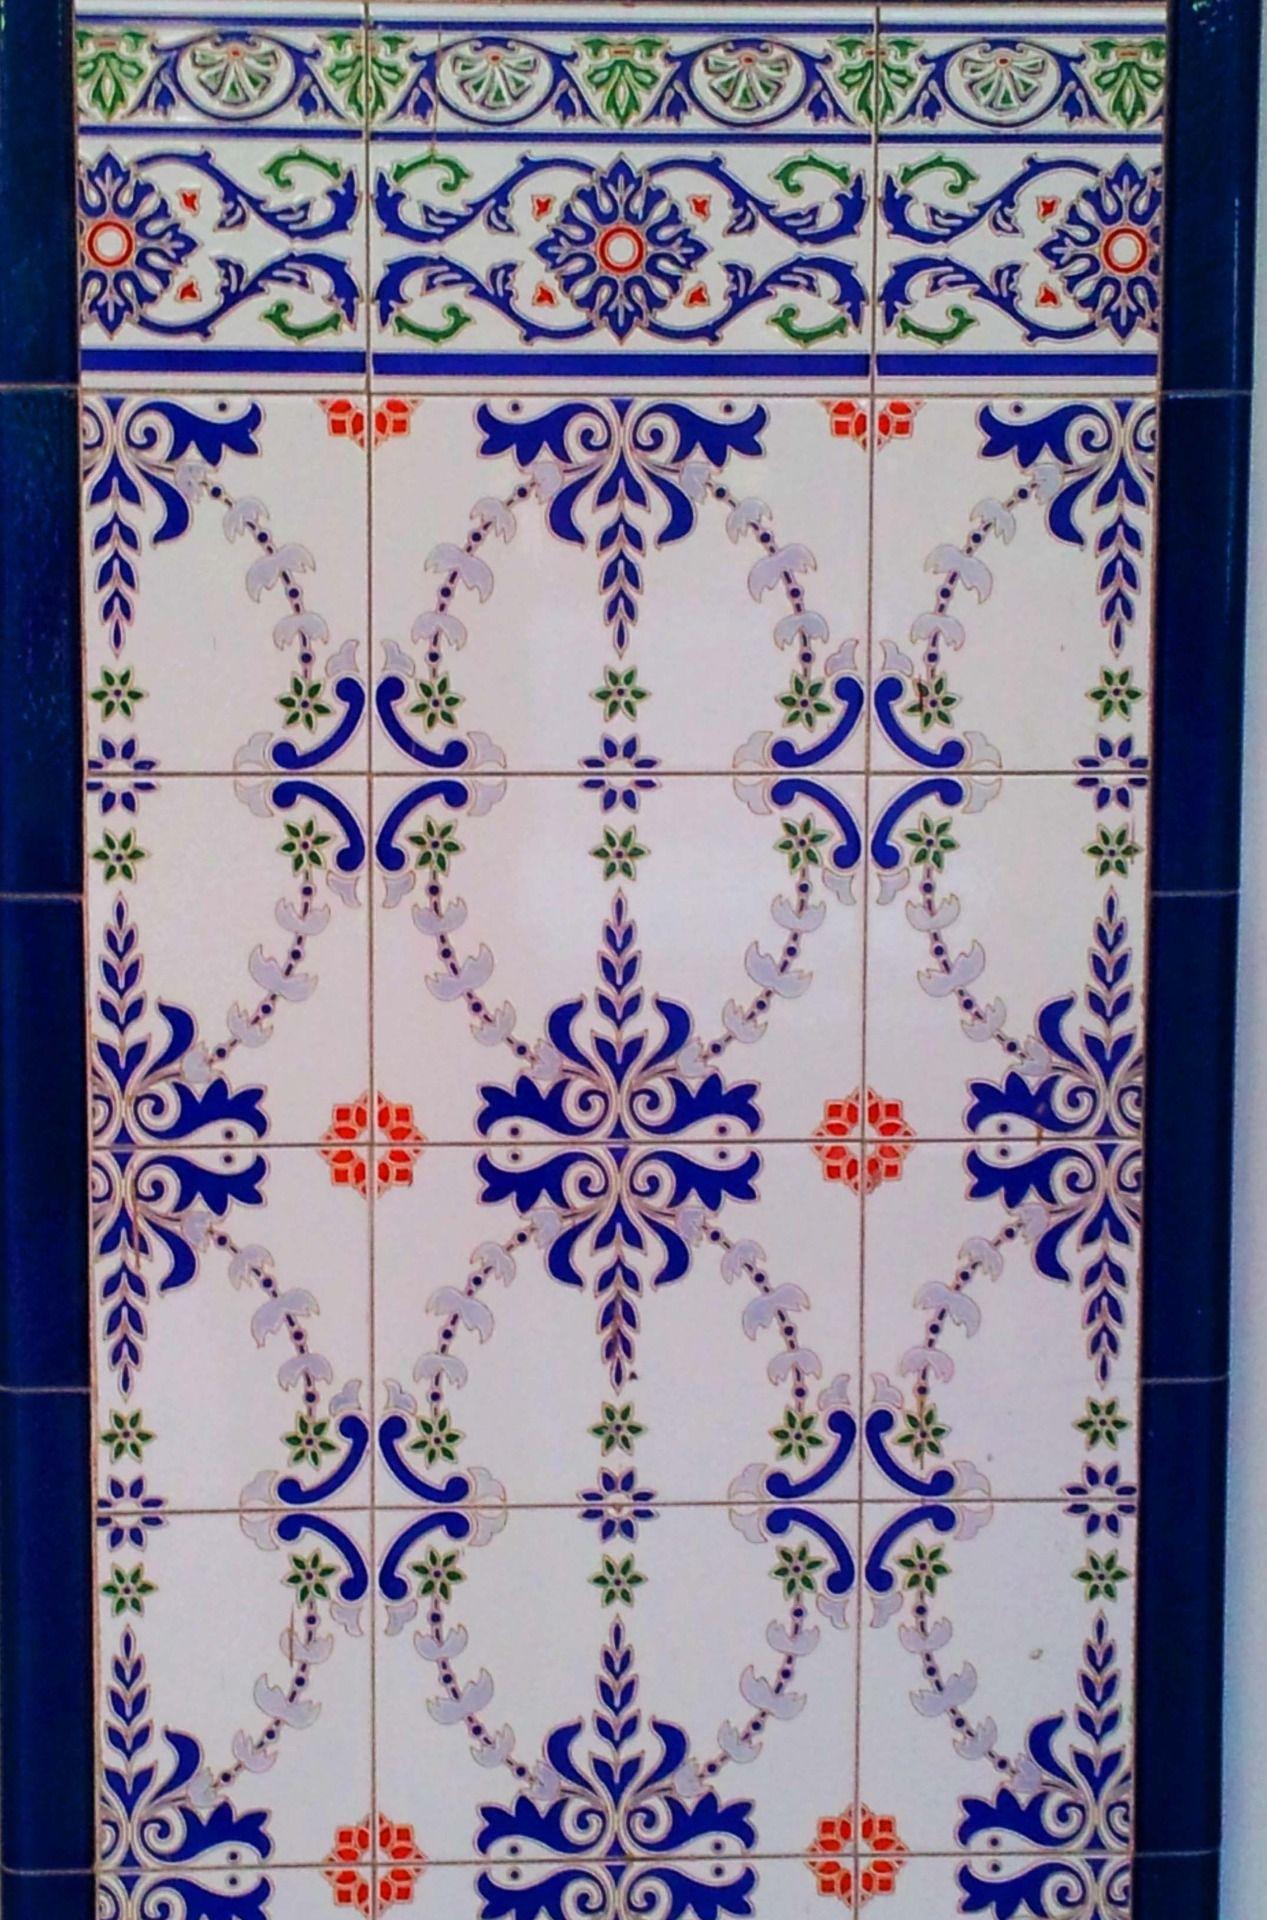 Street Tiles In Valencia Spain Stencil Designs Tiles Prints